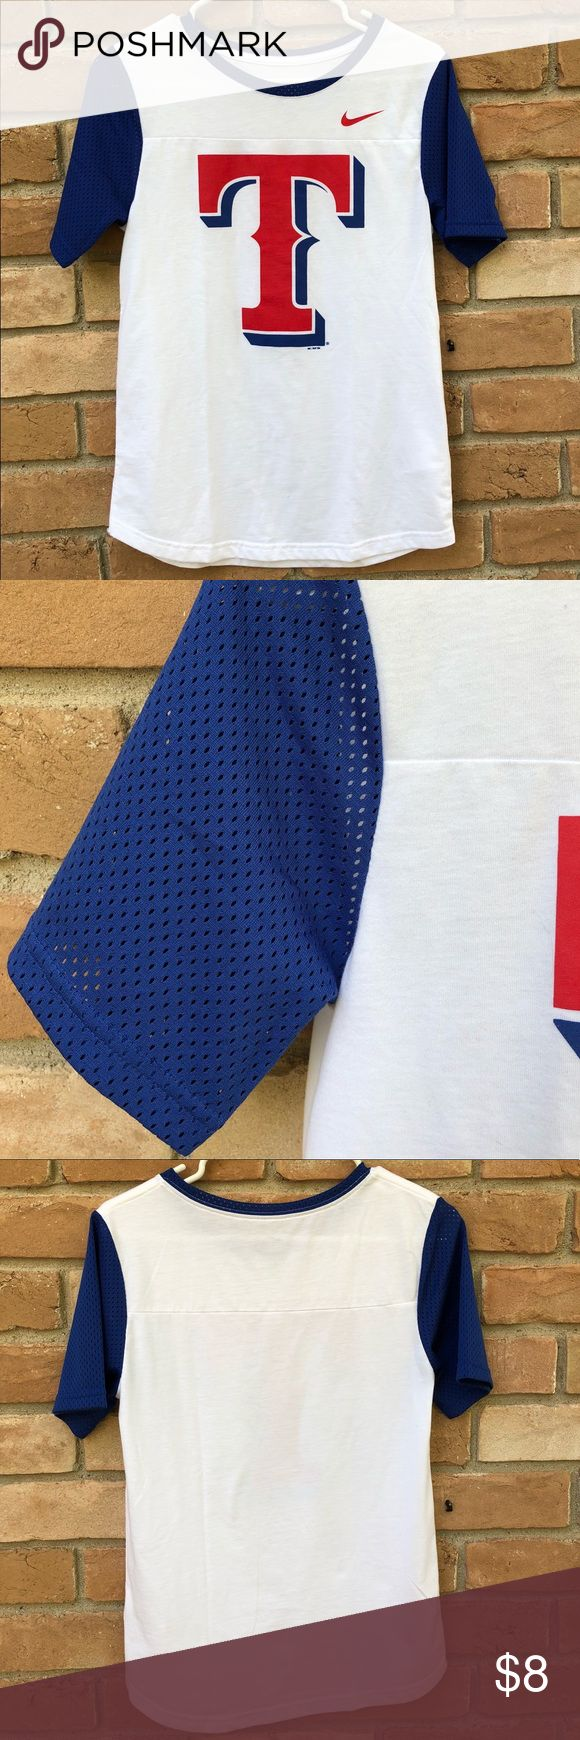 brand new e2b1a 049a8 Academy Womens Texas Rangers Shirts